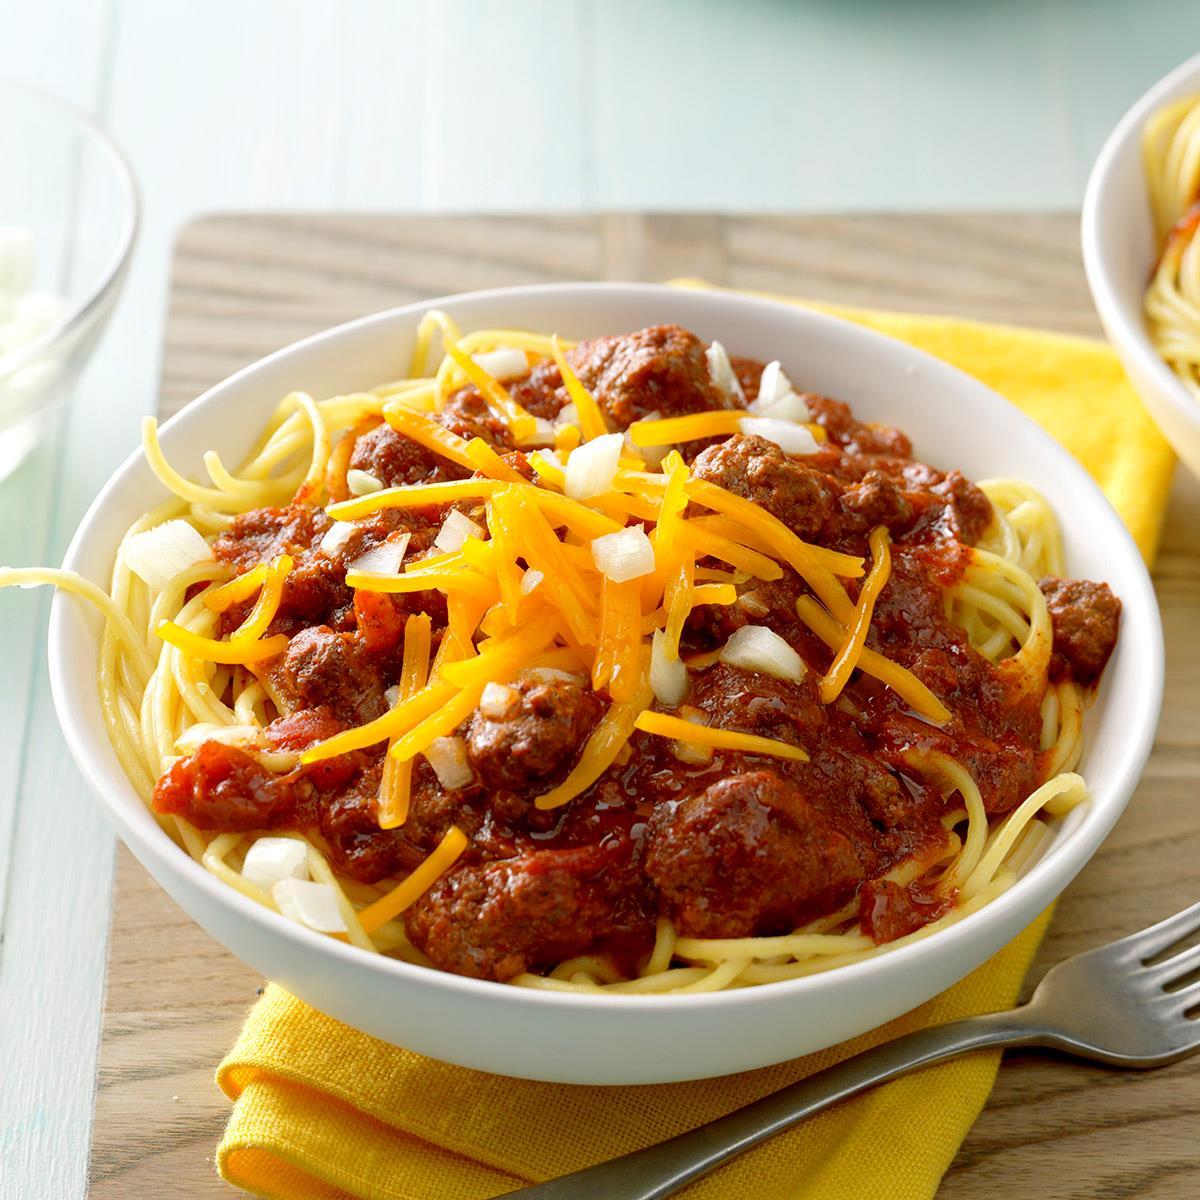 Carrie S Cincinnati Chili Recipe How To Make It Taste Of Home